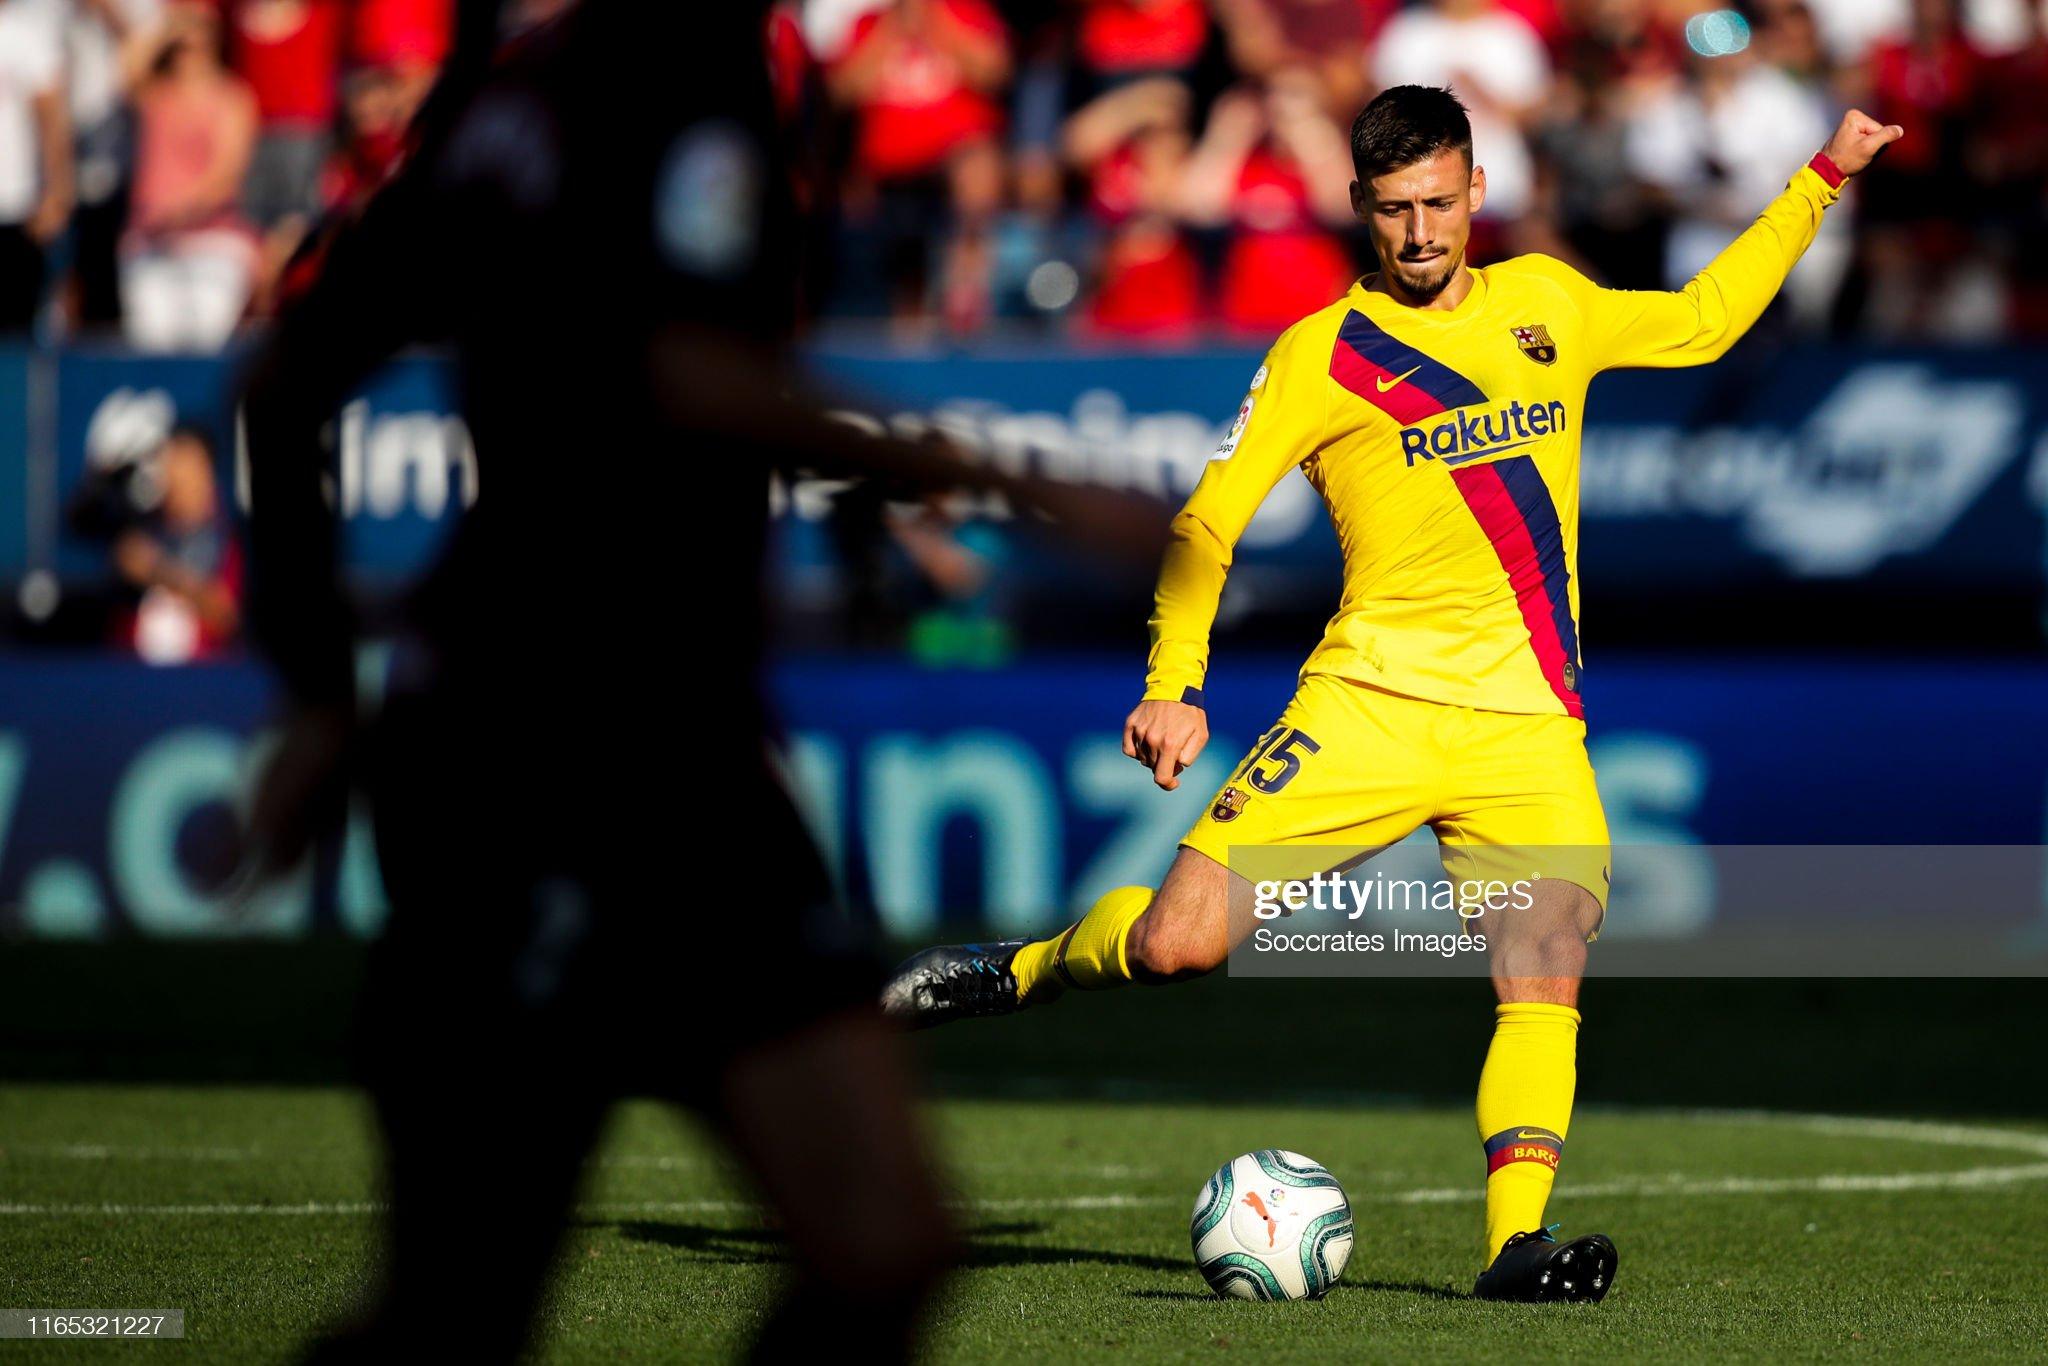 صور مباراة : أوساسونا - برشلونة 2-2 ( 31-08-2019 )  Clement-lenglet-of-fc-barcelona-during-the-la-liga-santander-match-picture-id1165321227?s=2048x2048